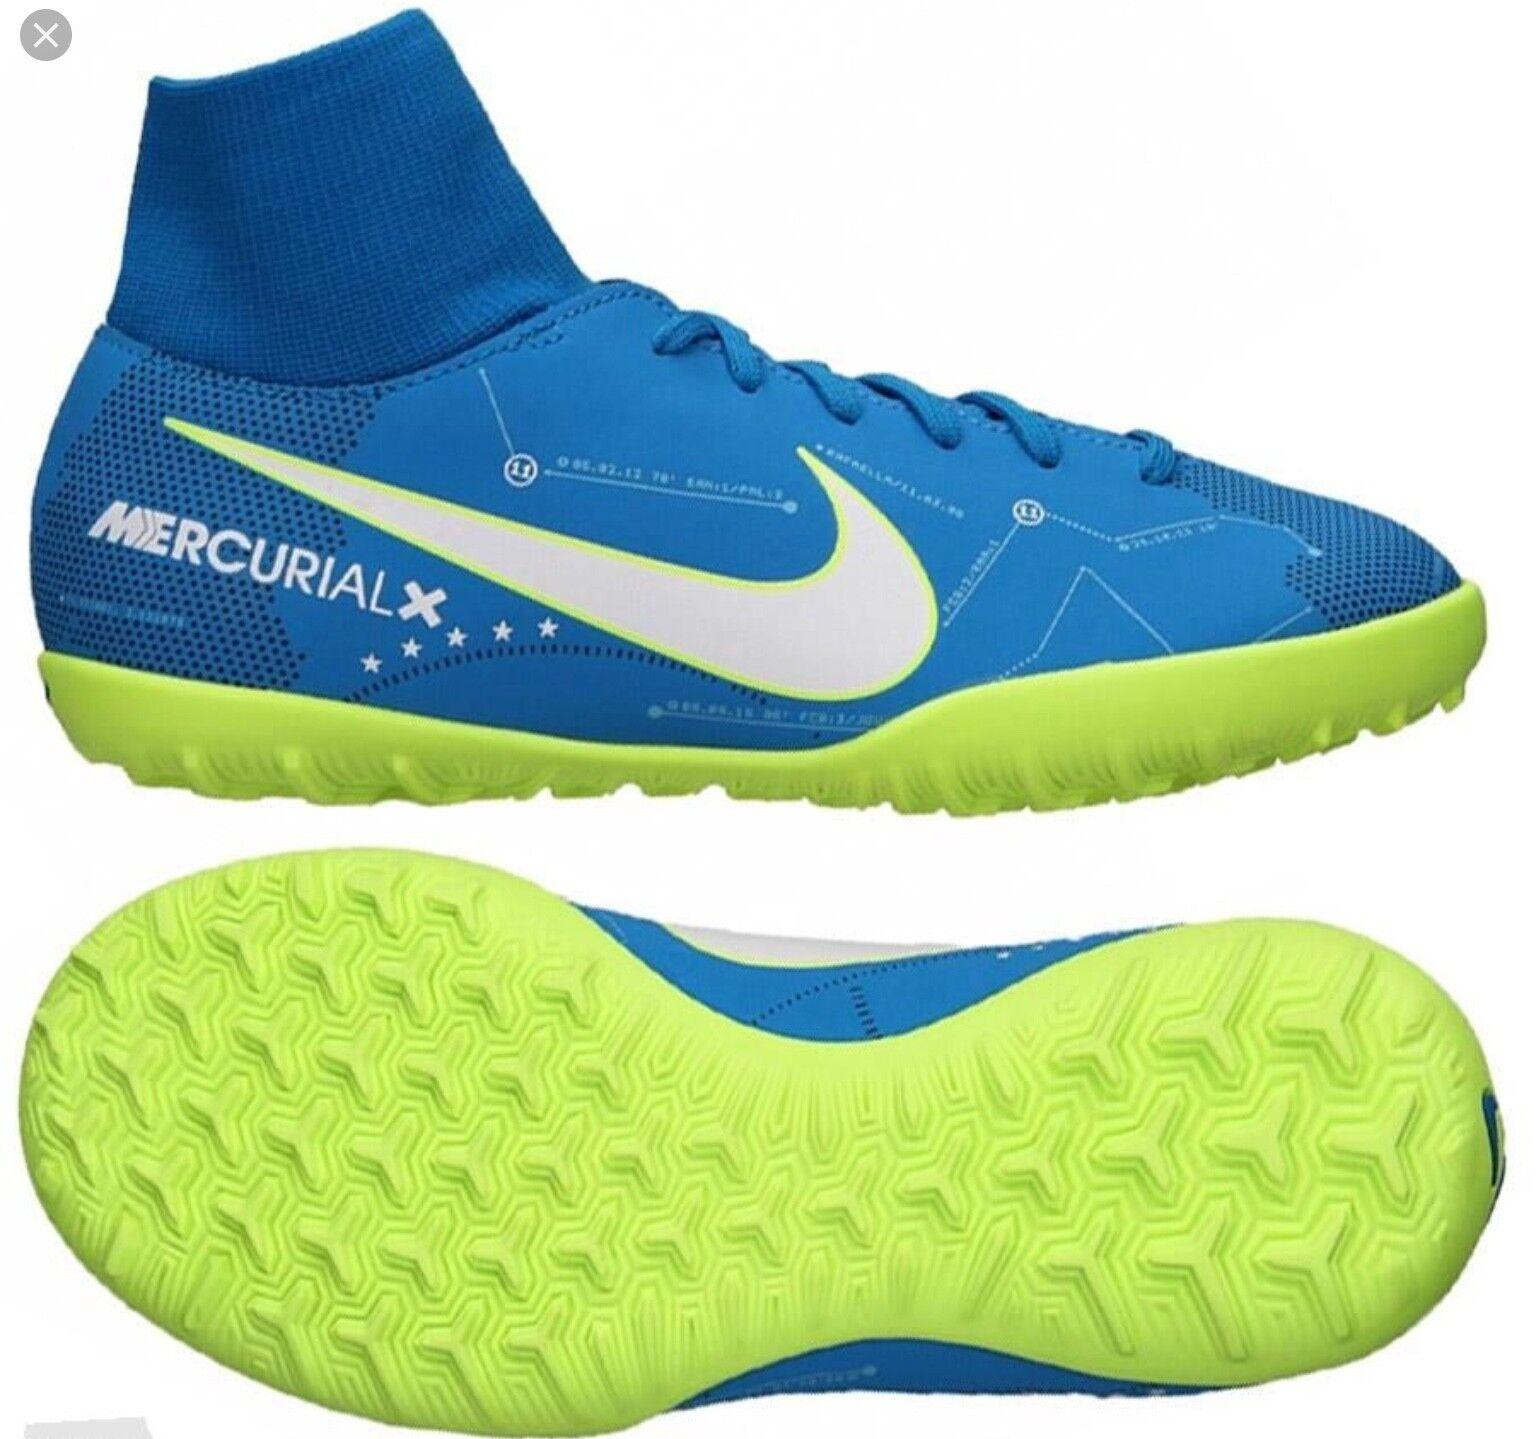 NIKE MERCURIALX VICTORY VI DF NJR IC Indoor Boot 921515 400 UK9.5 EU44.5 US10.5